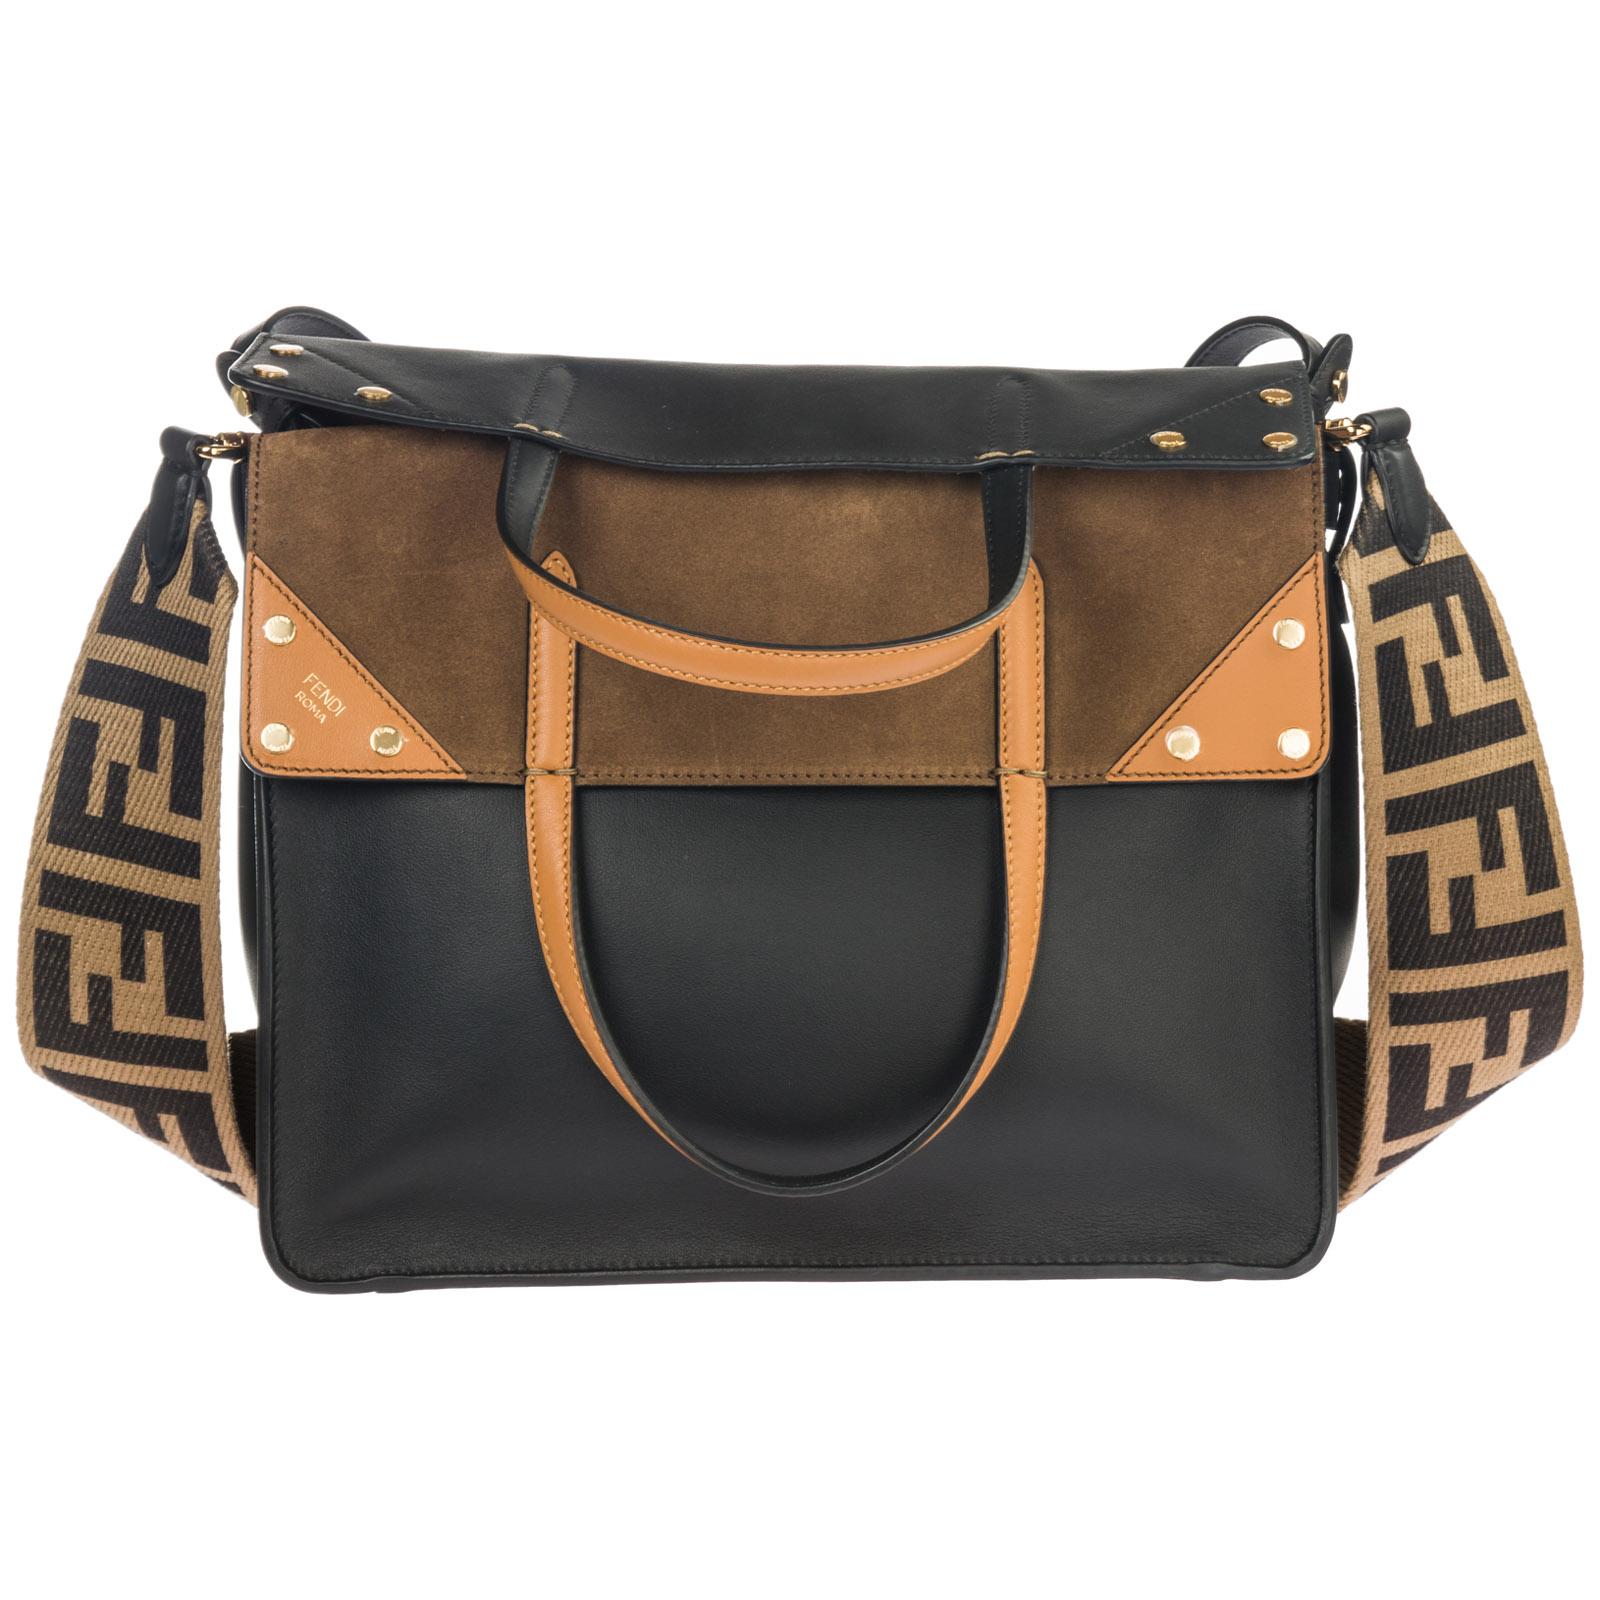 Fendi Women s handbag shopping bag purse tote in pelle flip large 926324485e